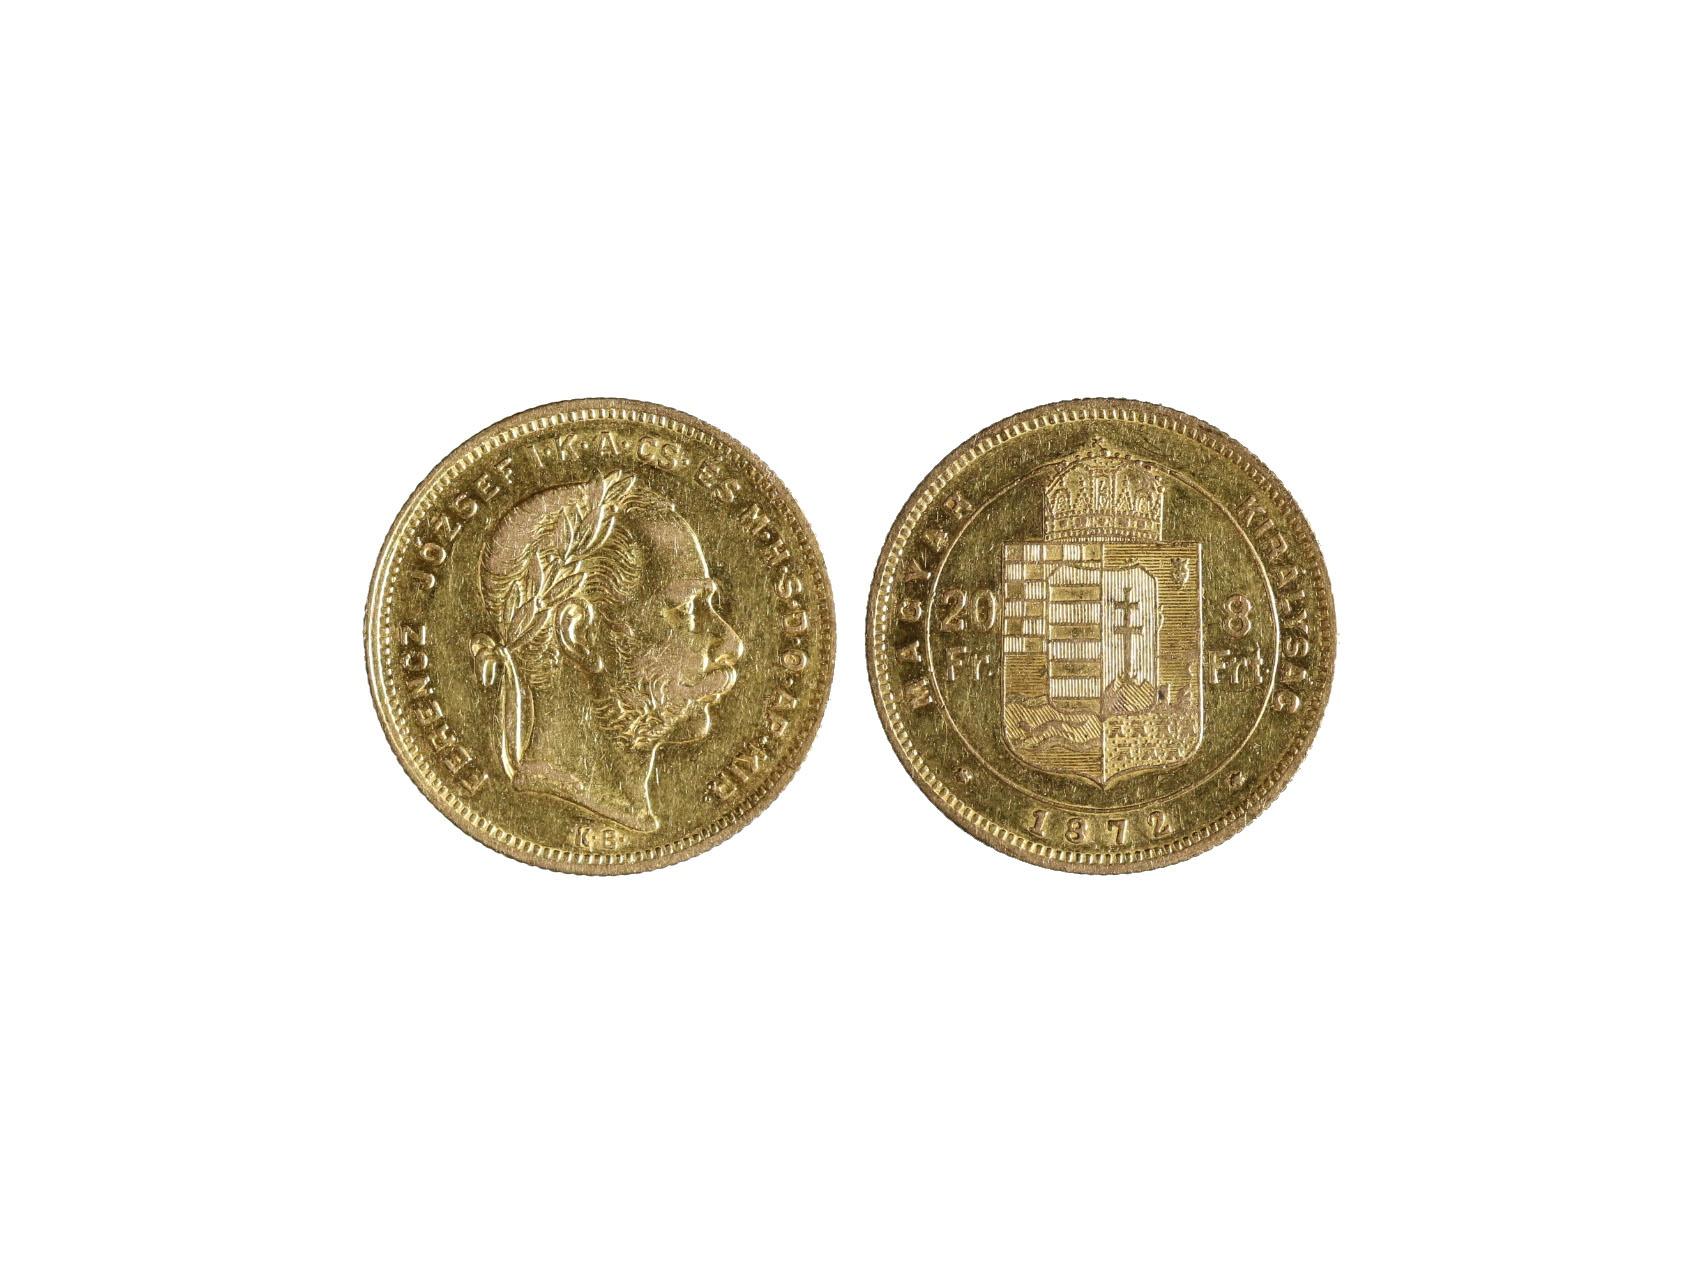 František Josef I. 1848-1916 - 8 Zlatník 1872 K.B., N127